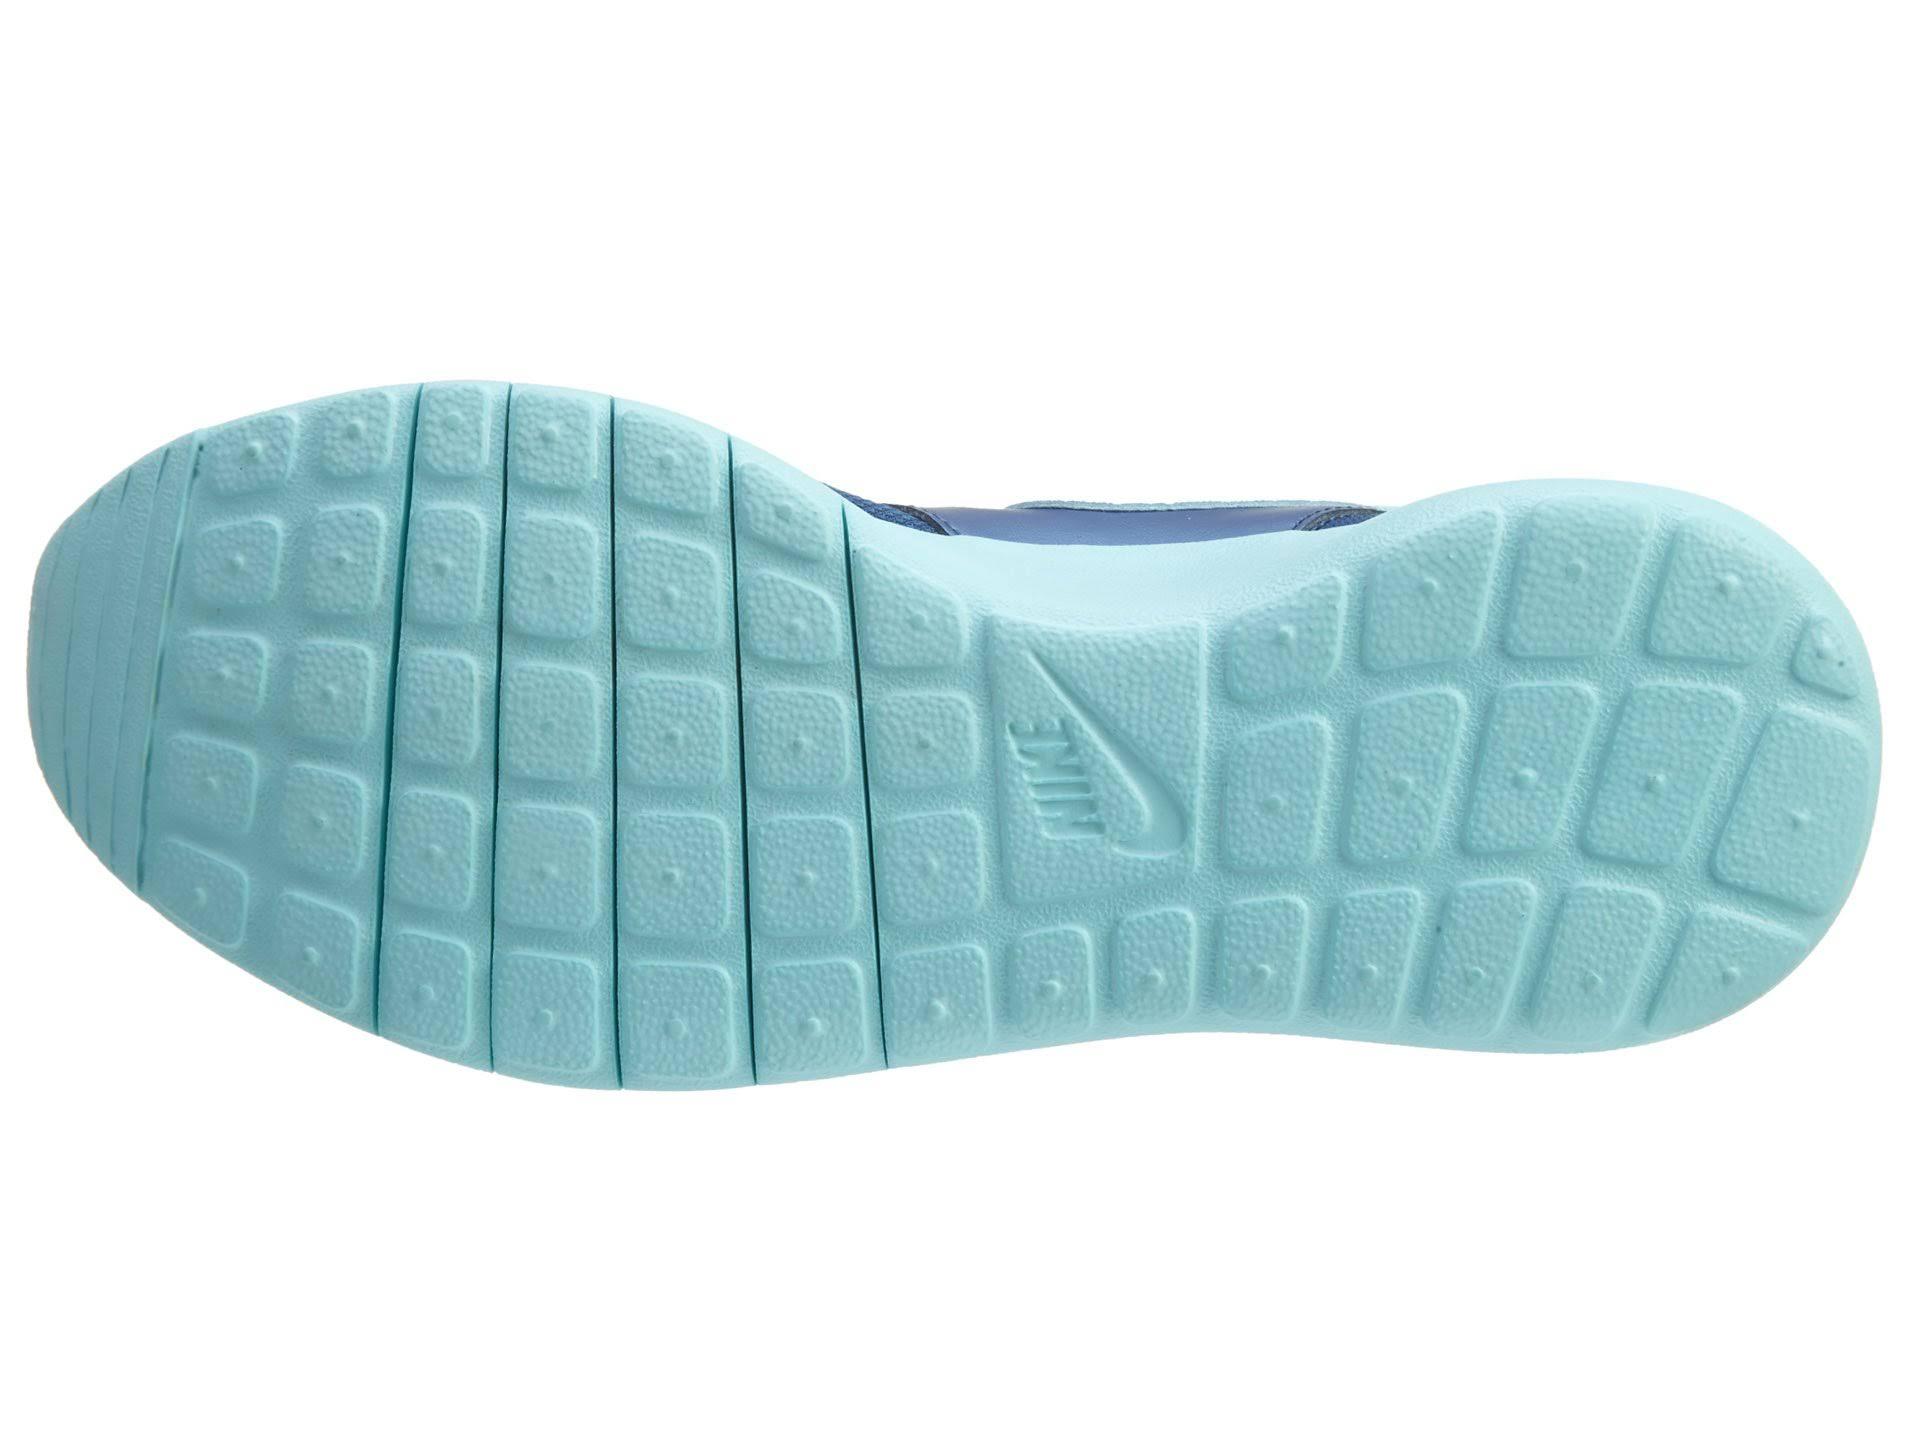 Tamaño Eu Youths De Copa 37 Blue Malla Nike Zapatillas vivid Pink Navy Deporte Insignia 5 One Roshe RP8nwxwW